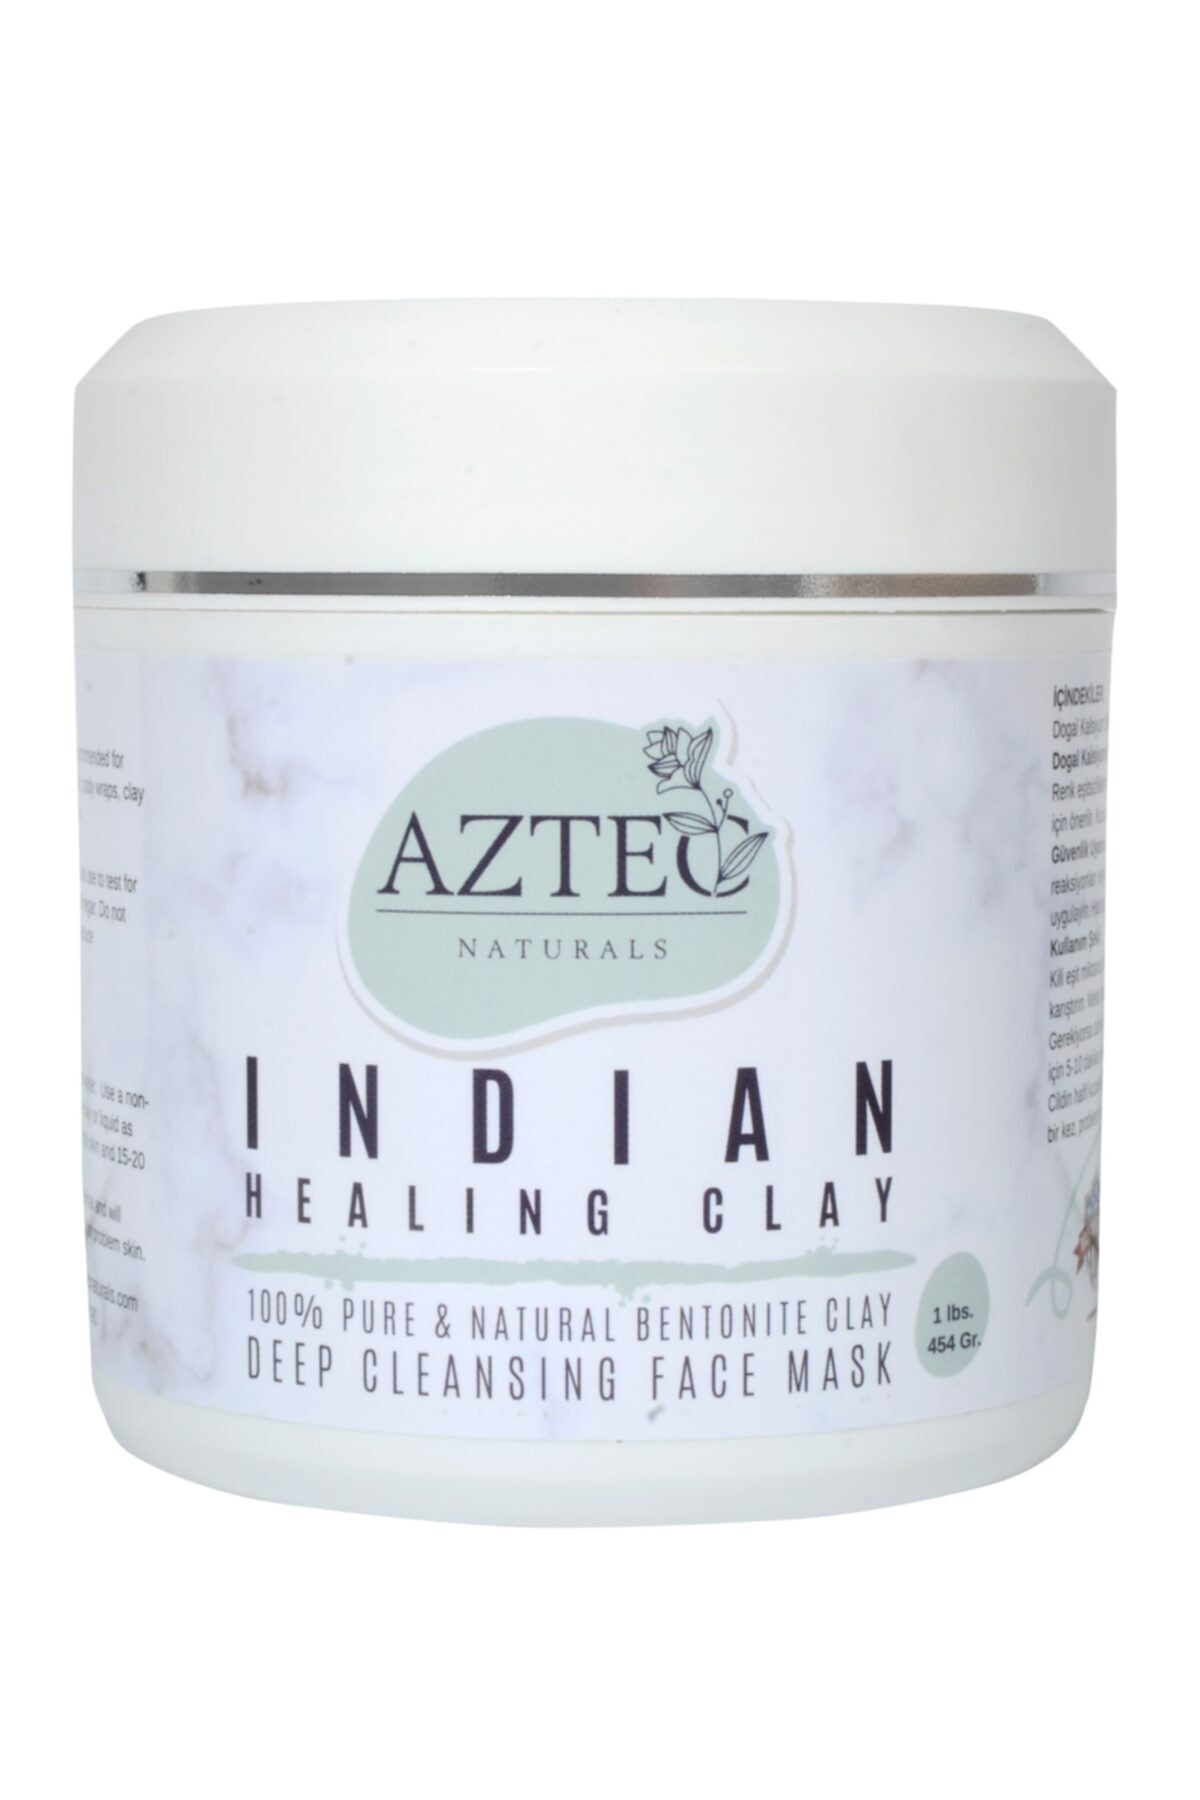 Kil Maskesi Indian Healing Clay Yüz Maskesi 454 Gr.